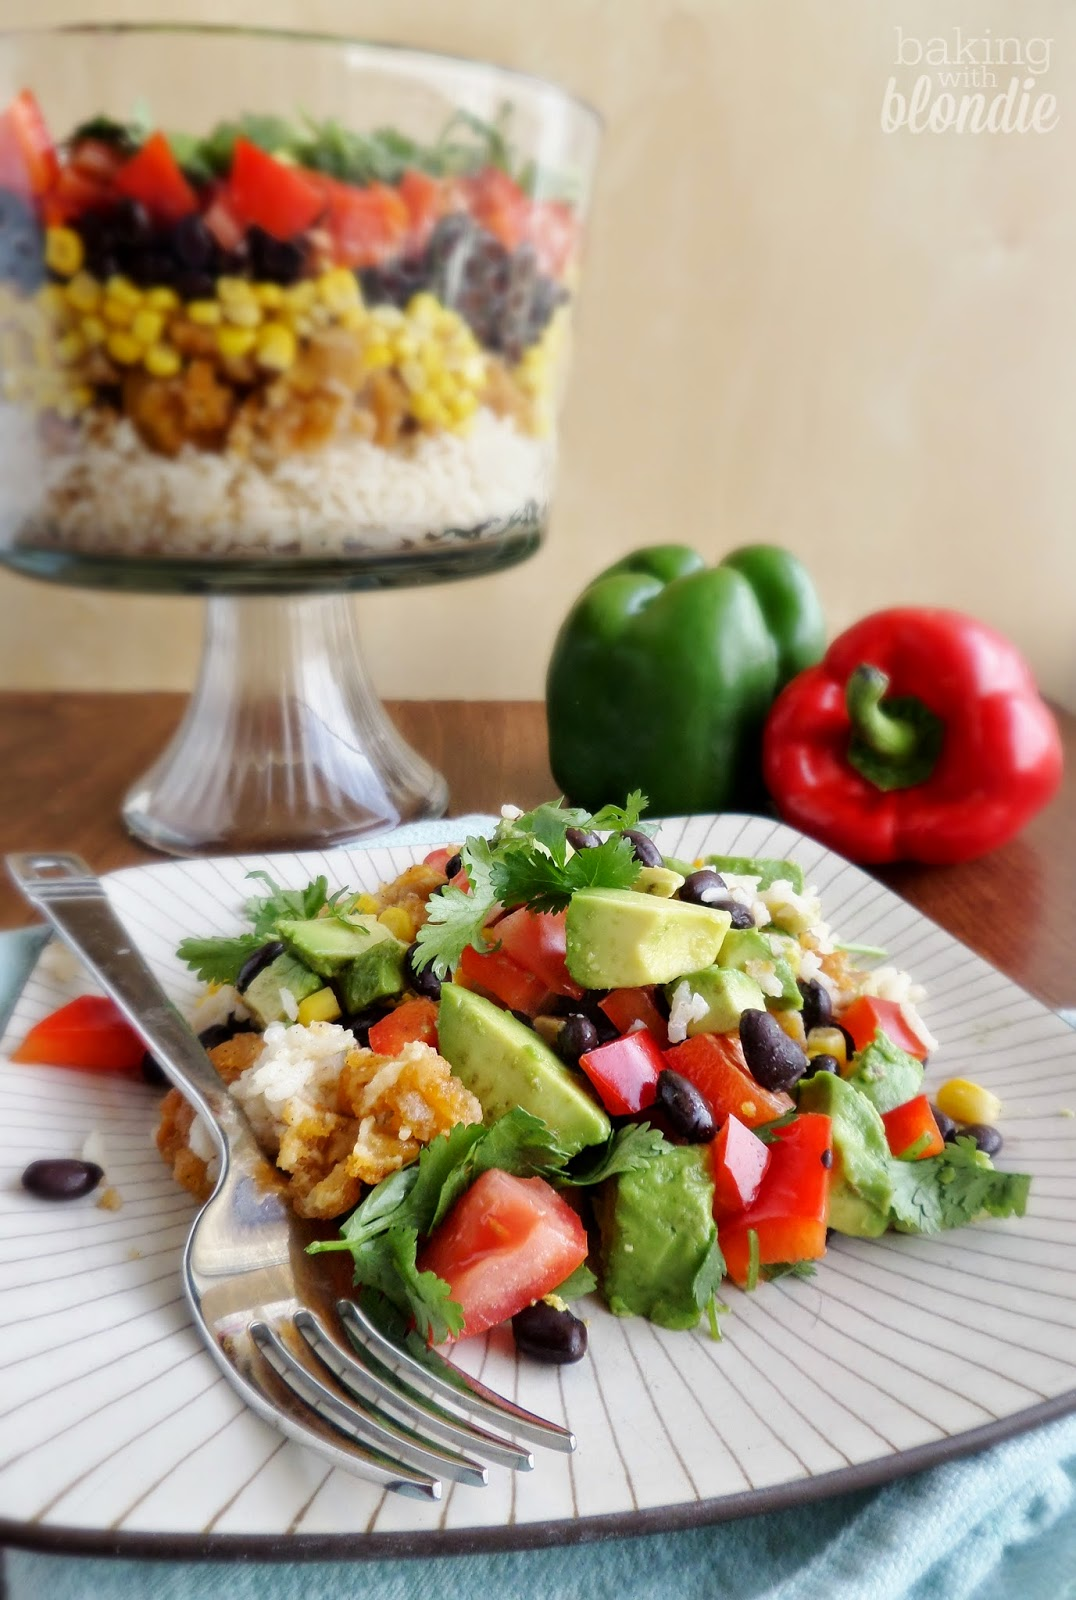 Layered Southwestern Rice Salad